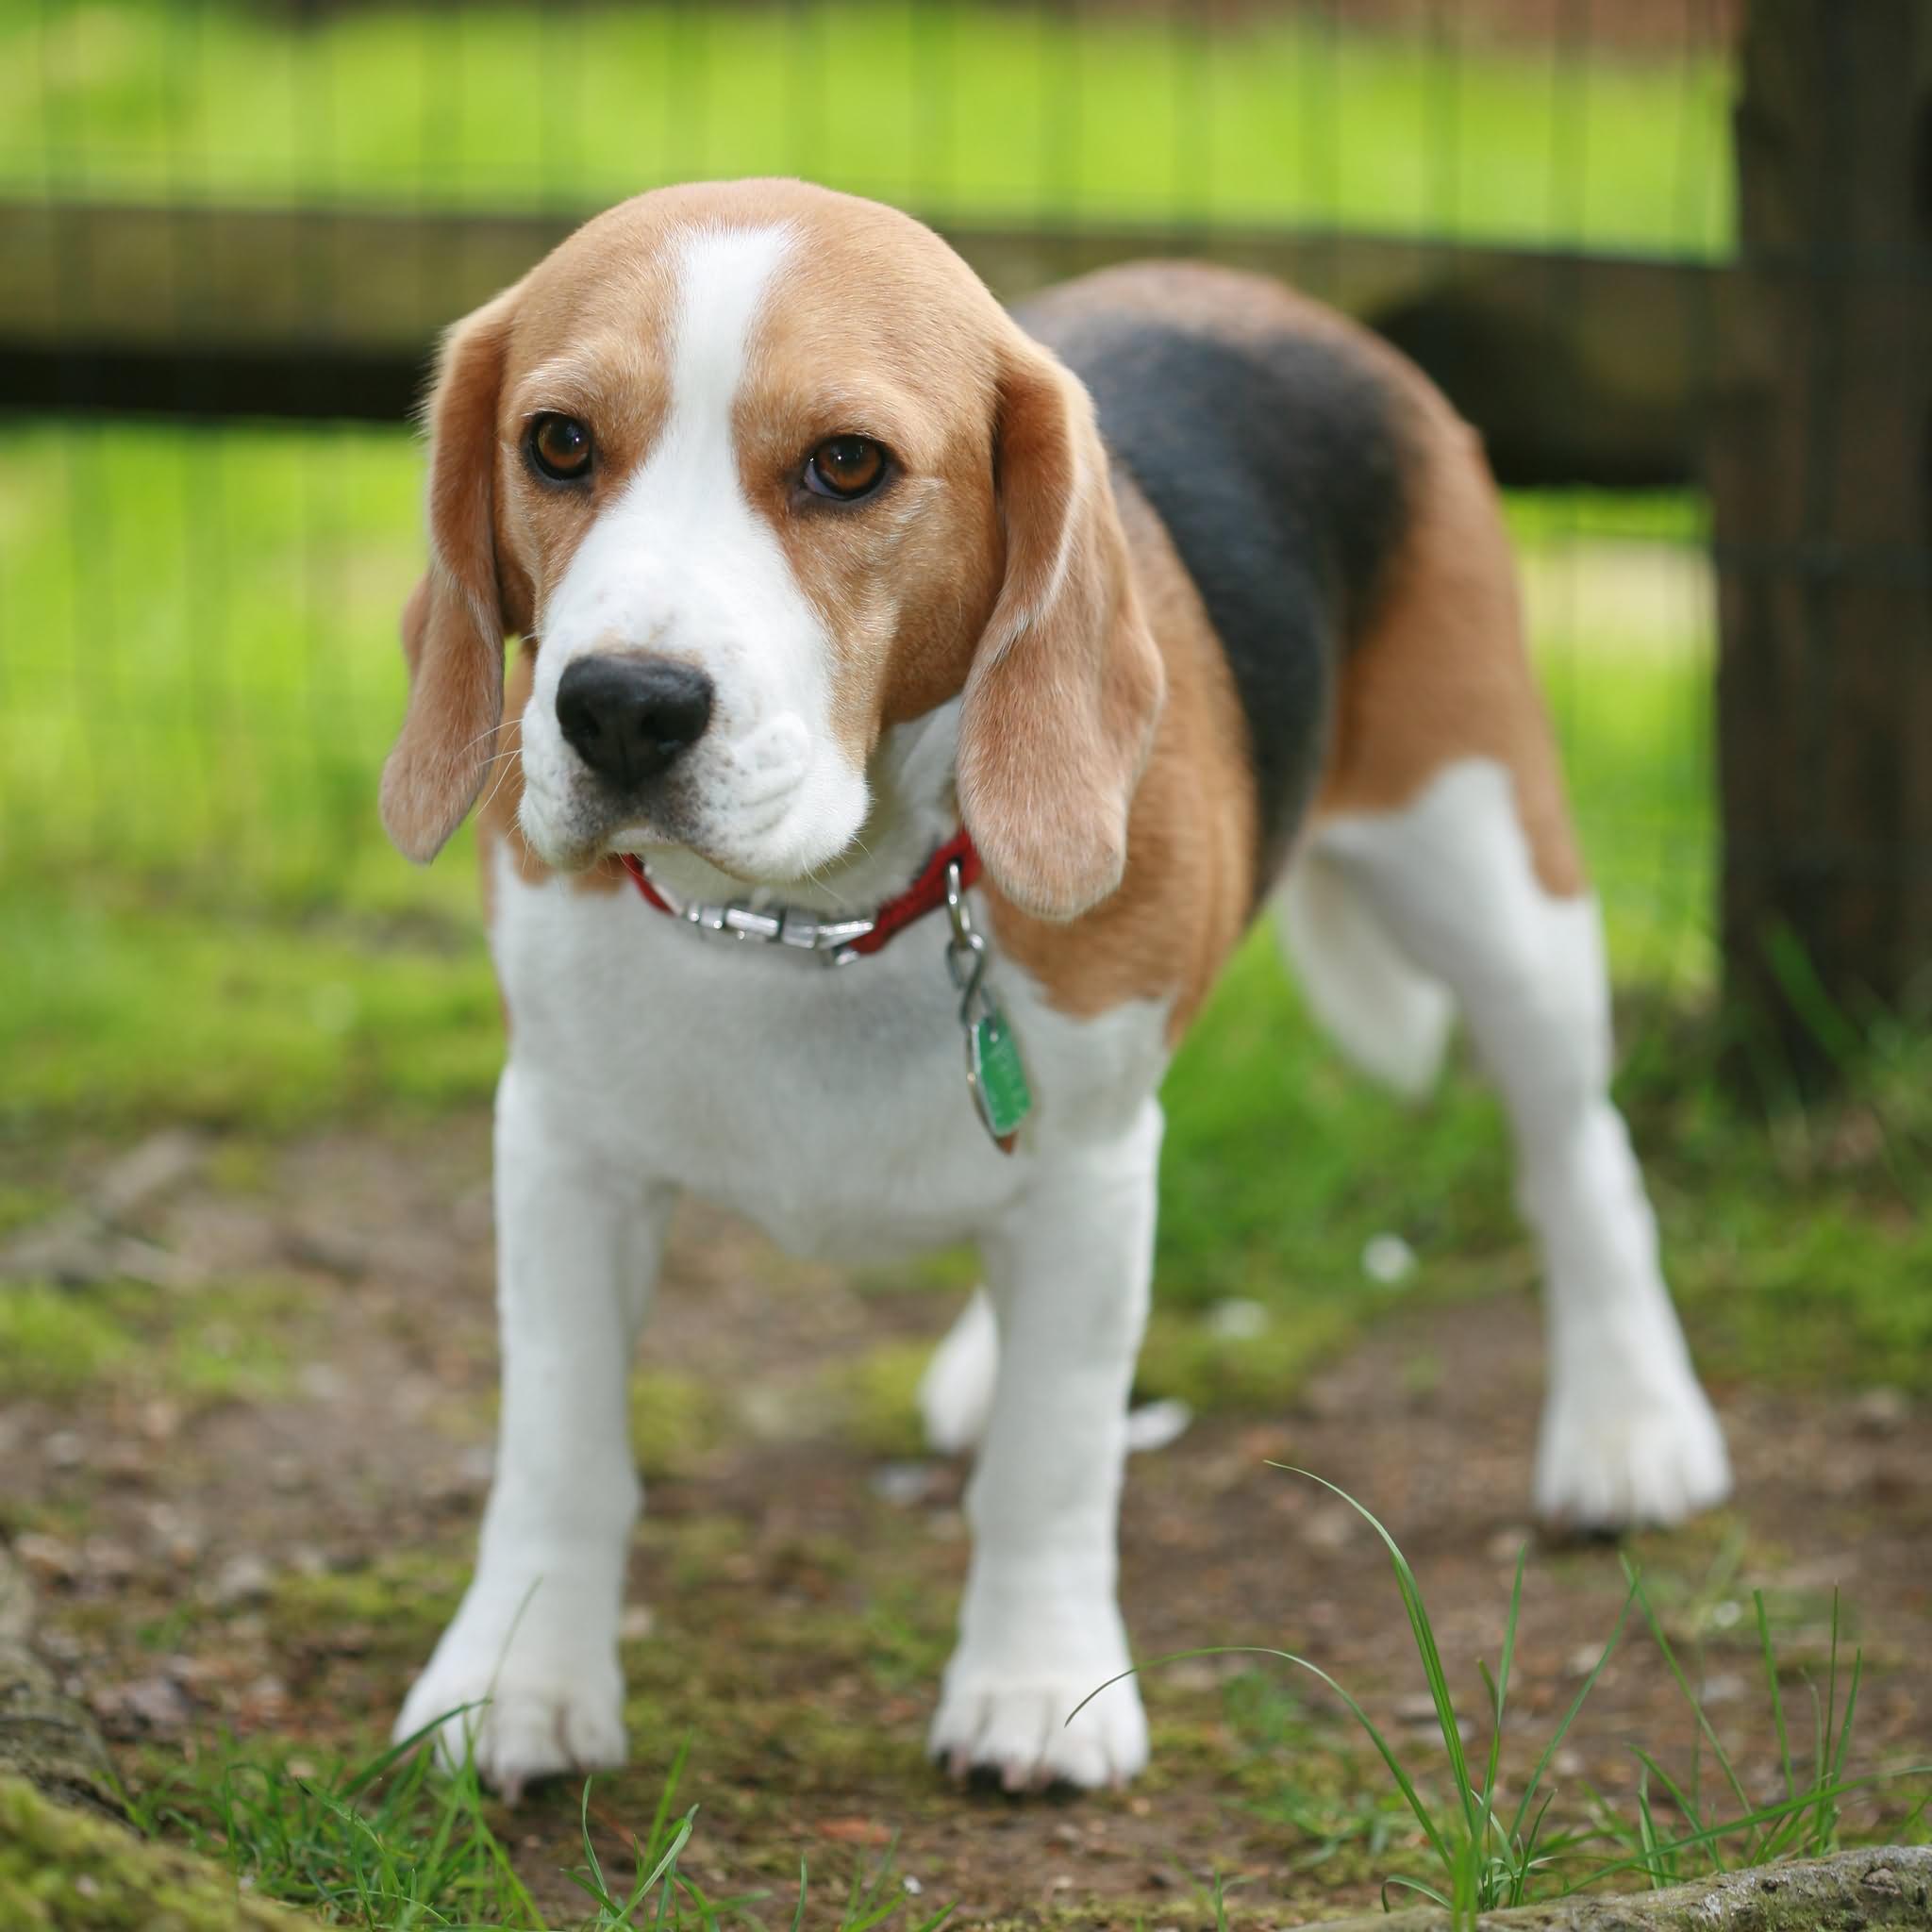 40 Very Beautiful Beagle Dog Photos And Images